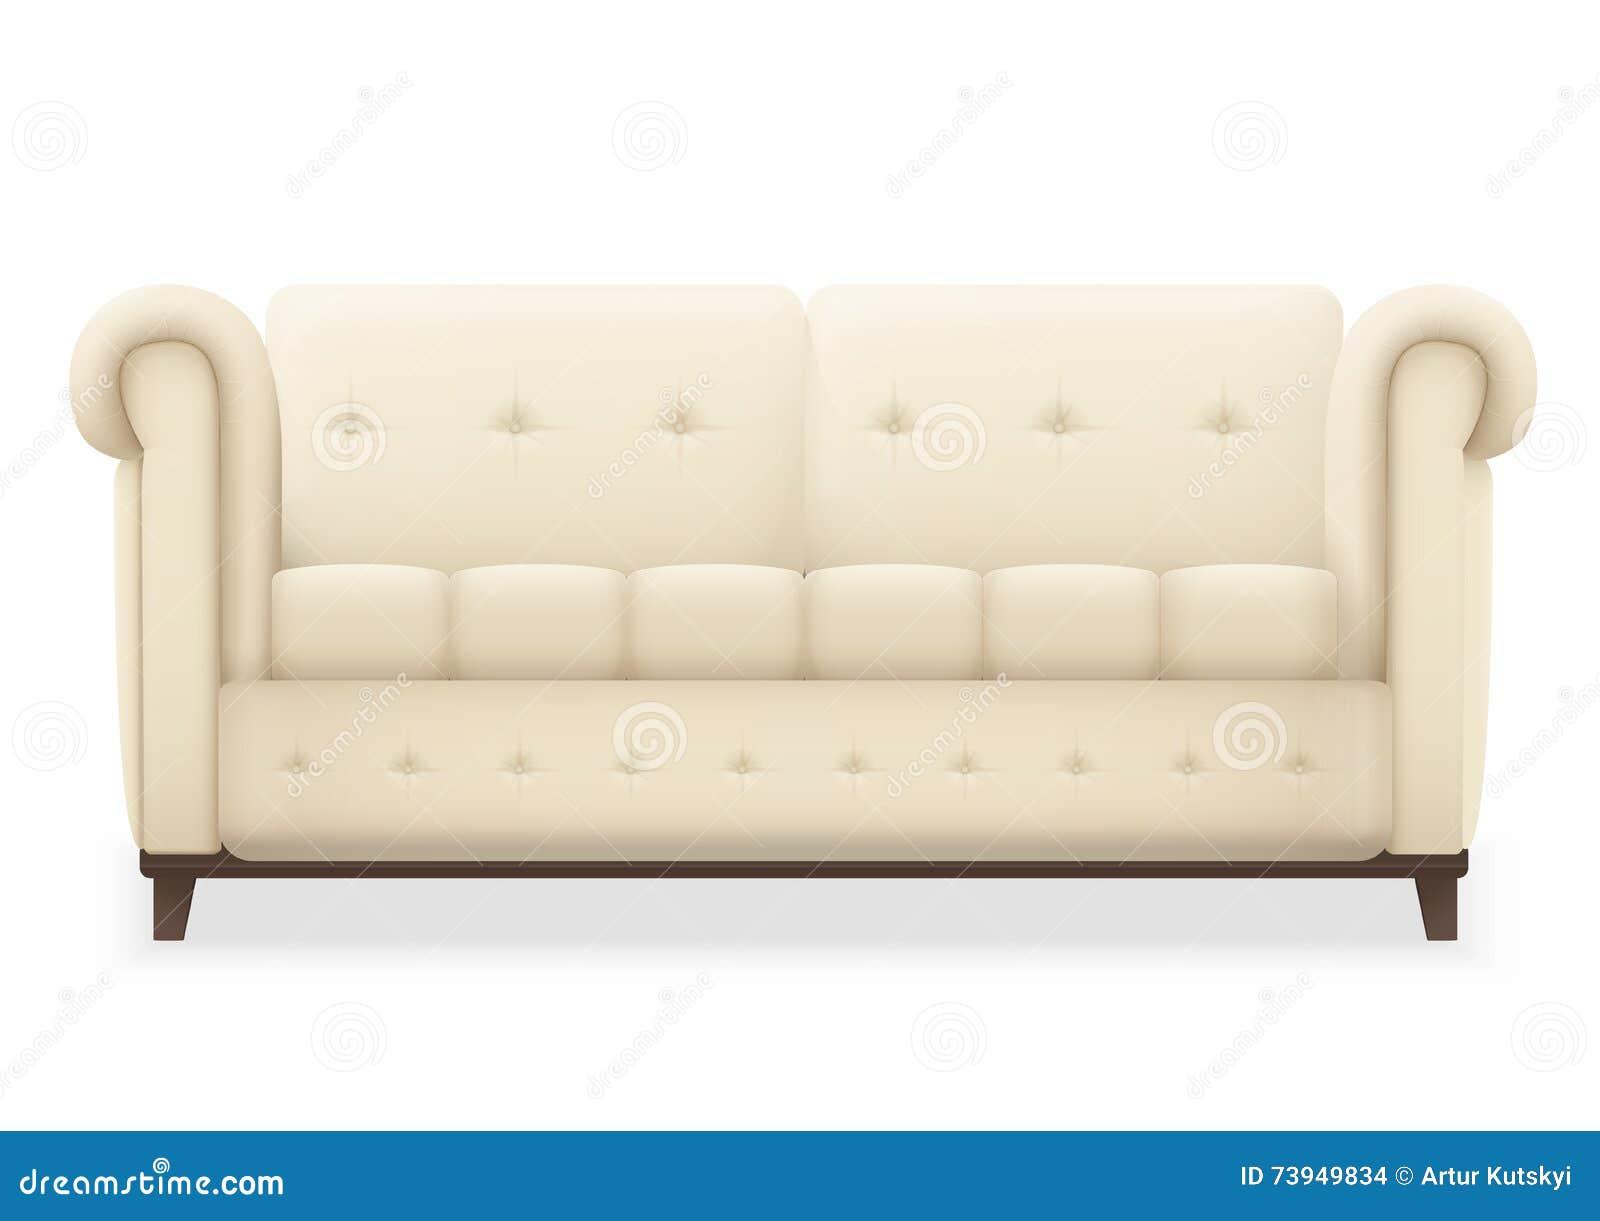 Leather Modern Sofa Stock Illustrations 11 411 Leather Modern Sofa Stock Illustrations Vectors Clipart Dreamstime